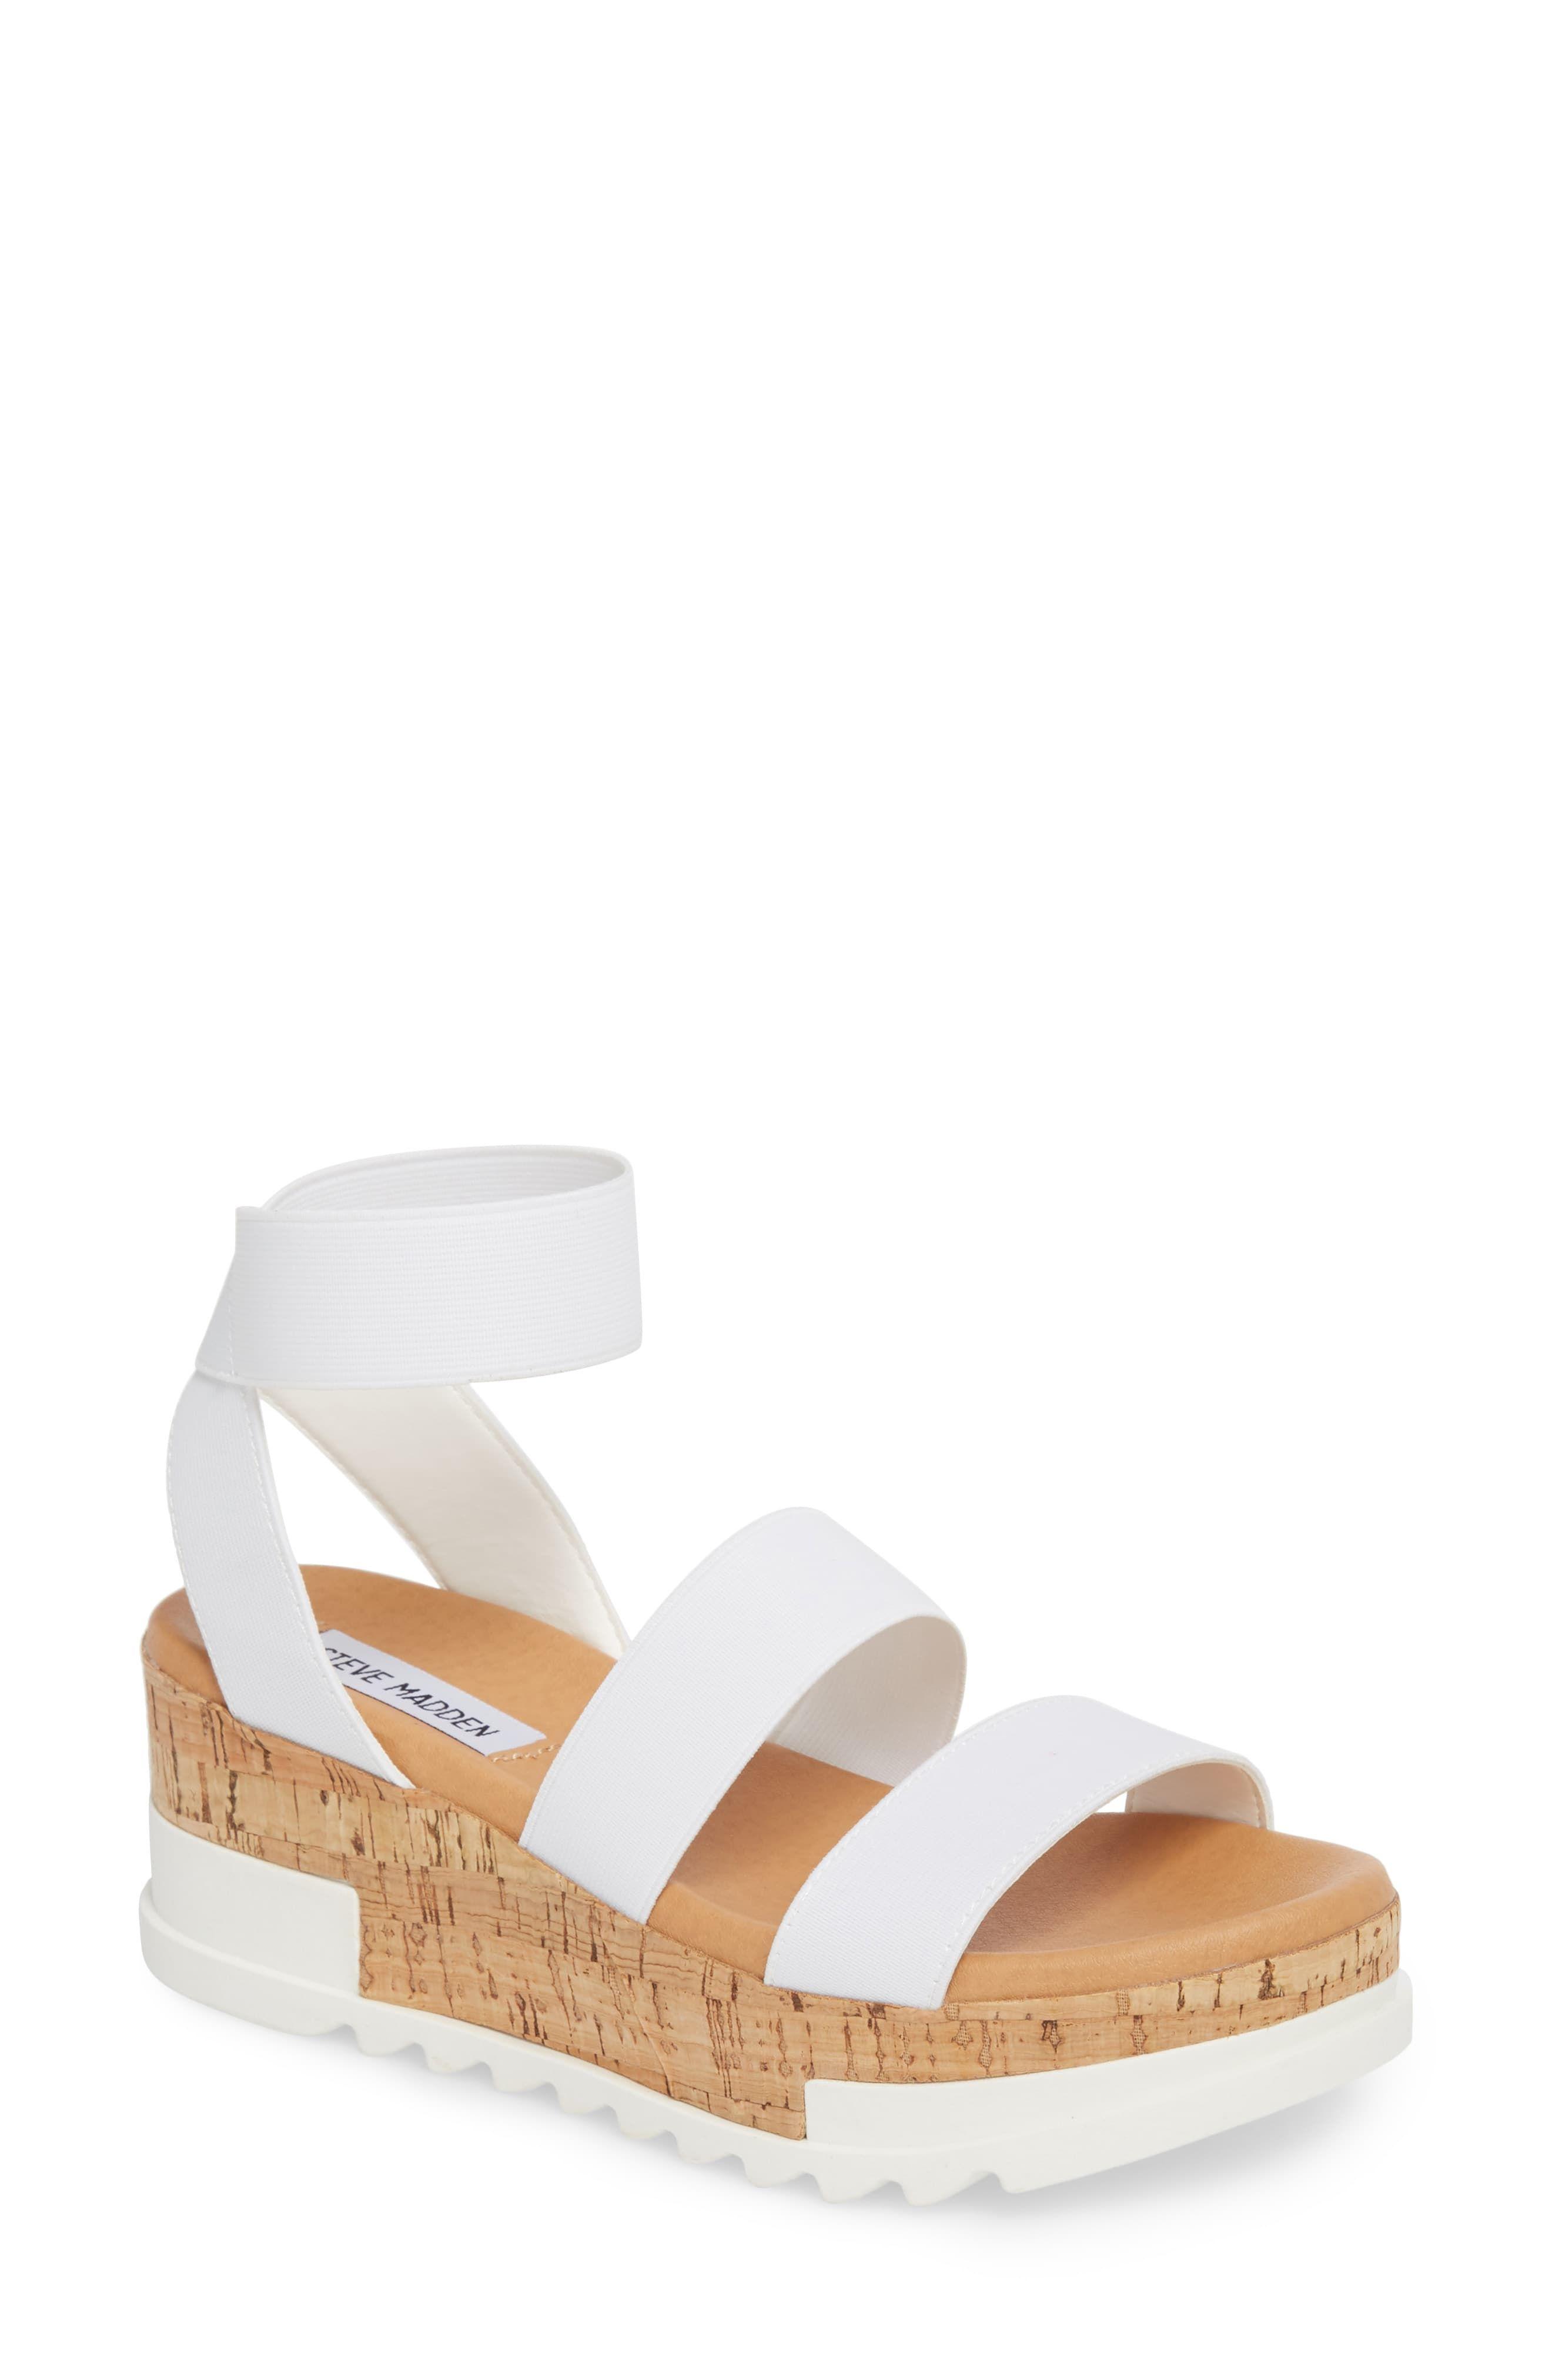 6037c686cd4 Women's Steve Madden Bandi Platform Wedge Sandal, Size 11 M - Brown ...